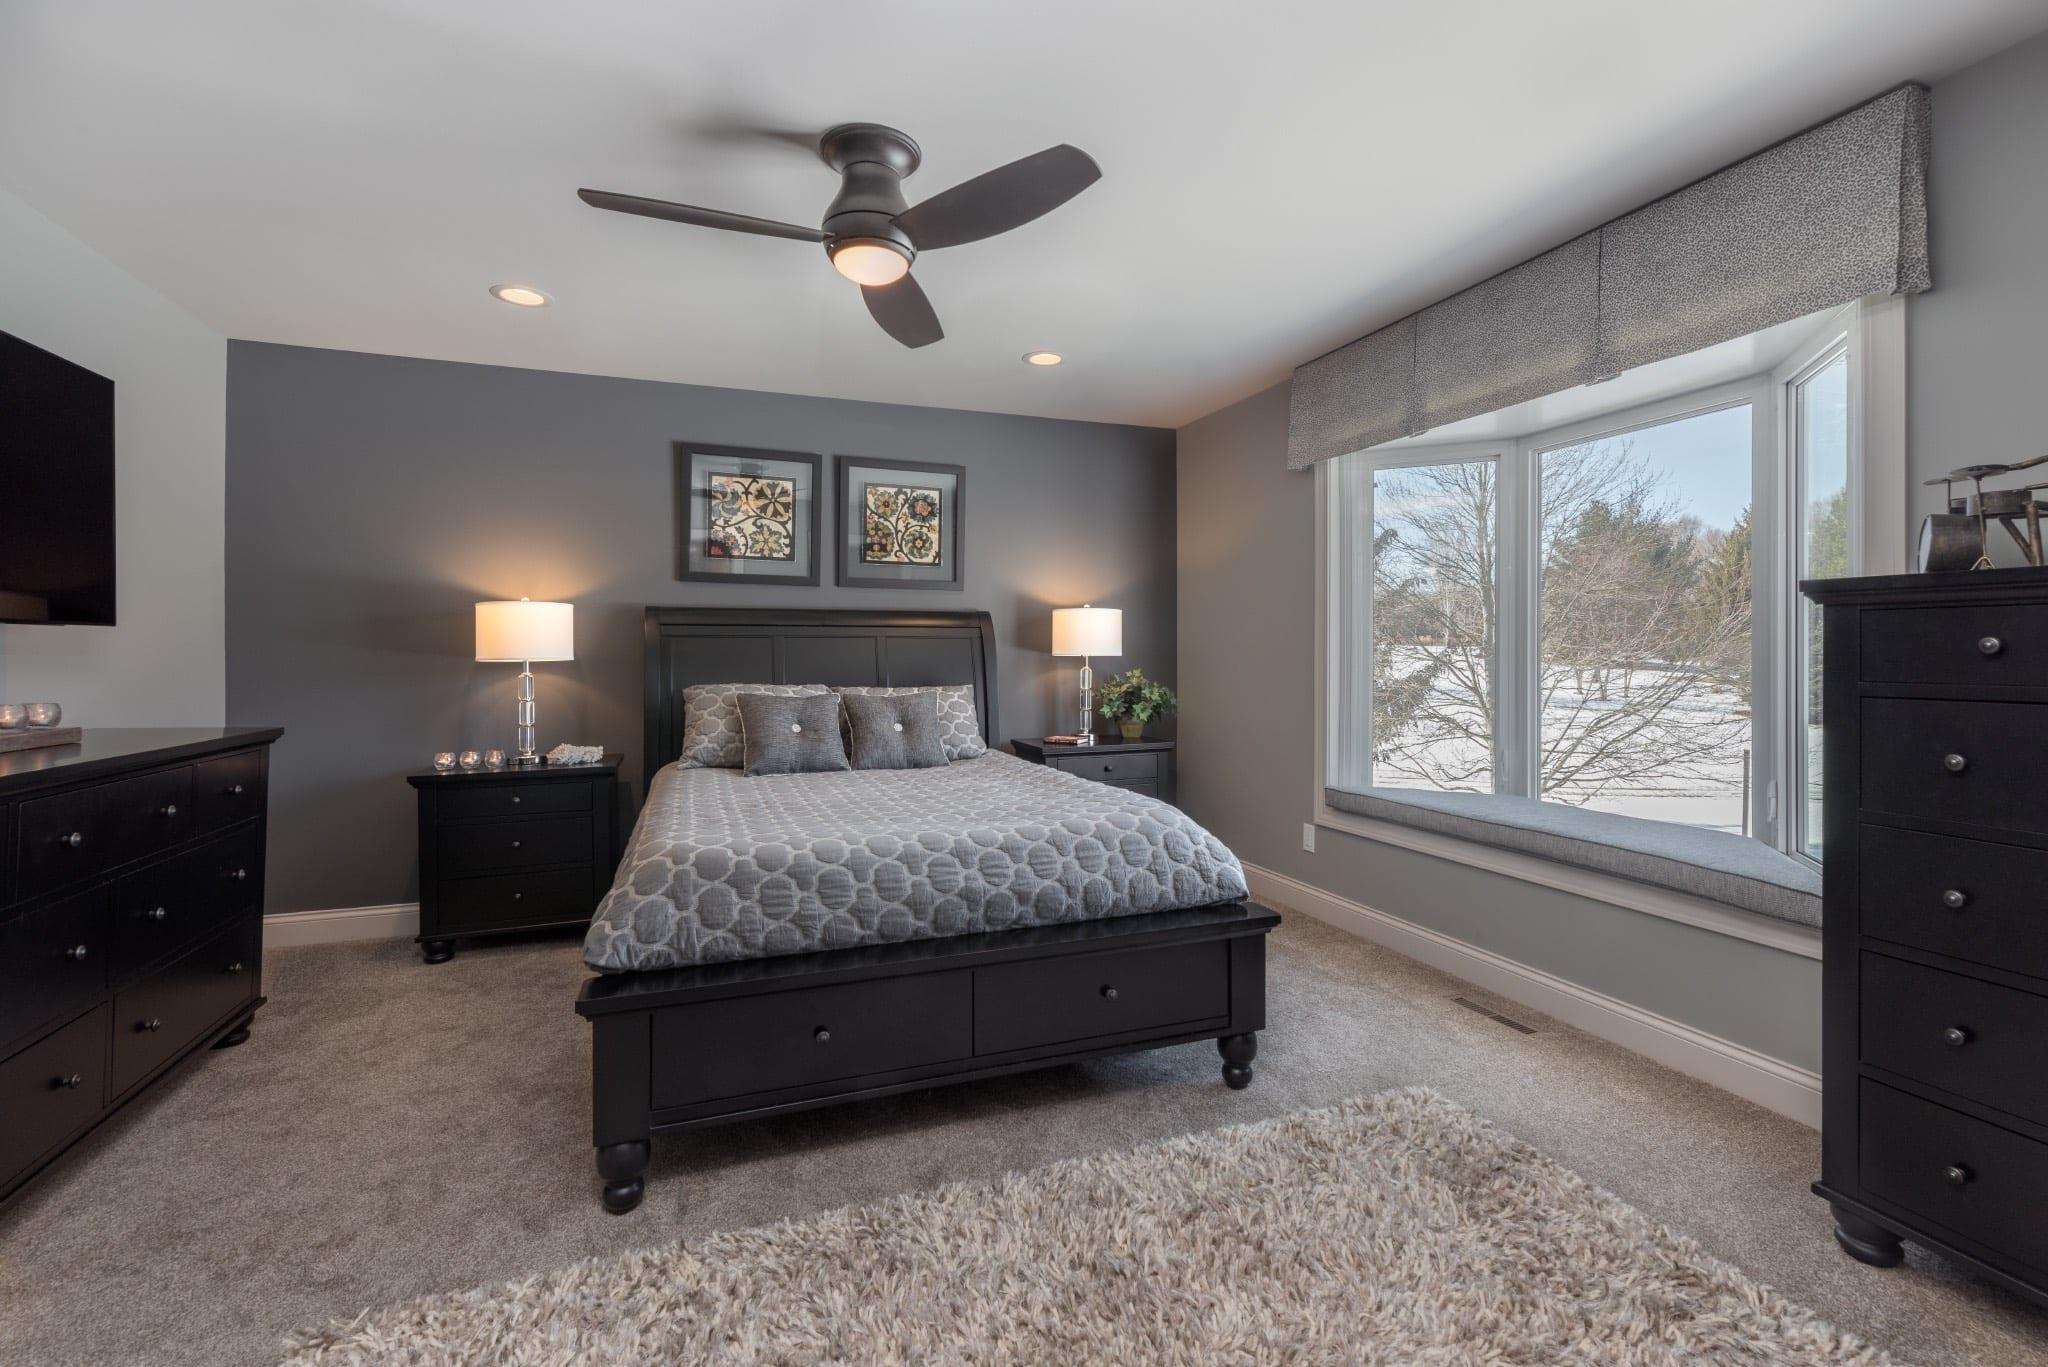 Crystal Lake Interior Design | Bedroom Furnishings